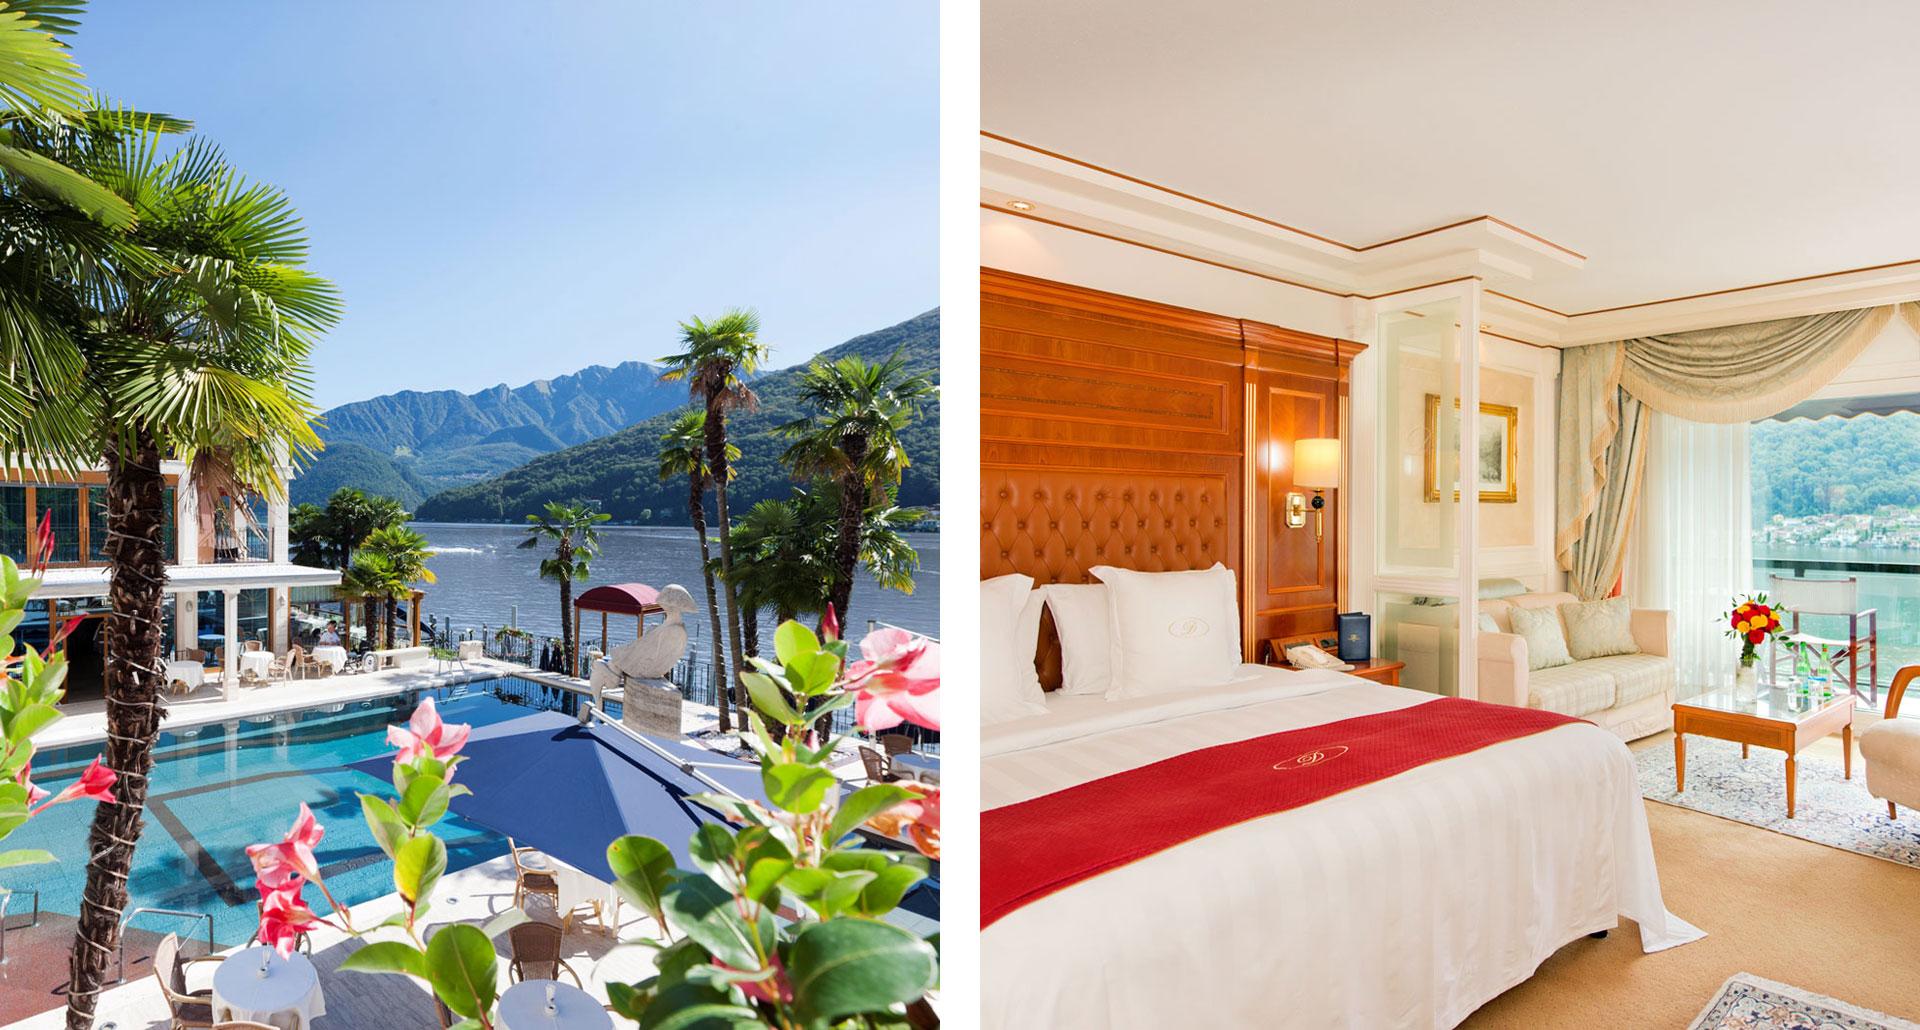 Swiss Diamond Hotel Lugano - boutique hotel in Switzerland